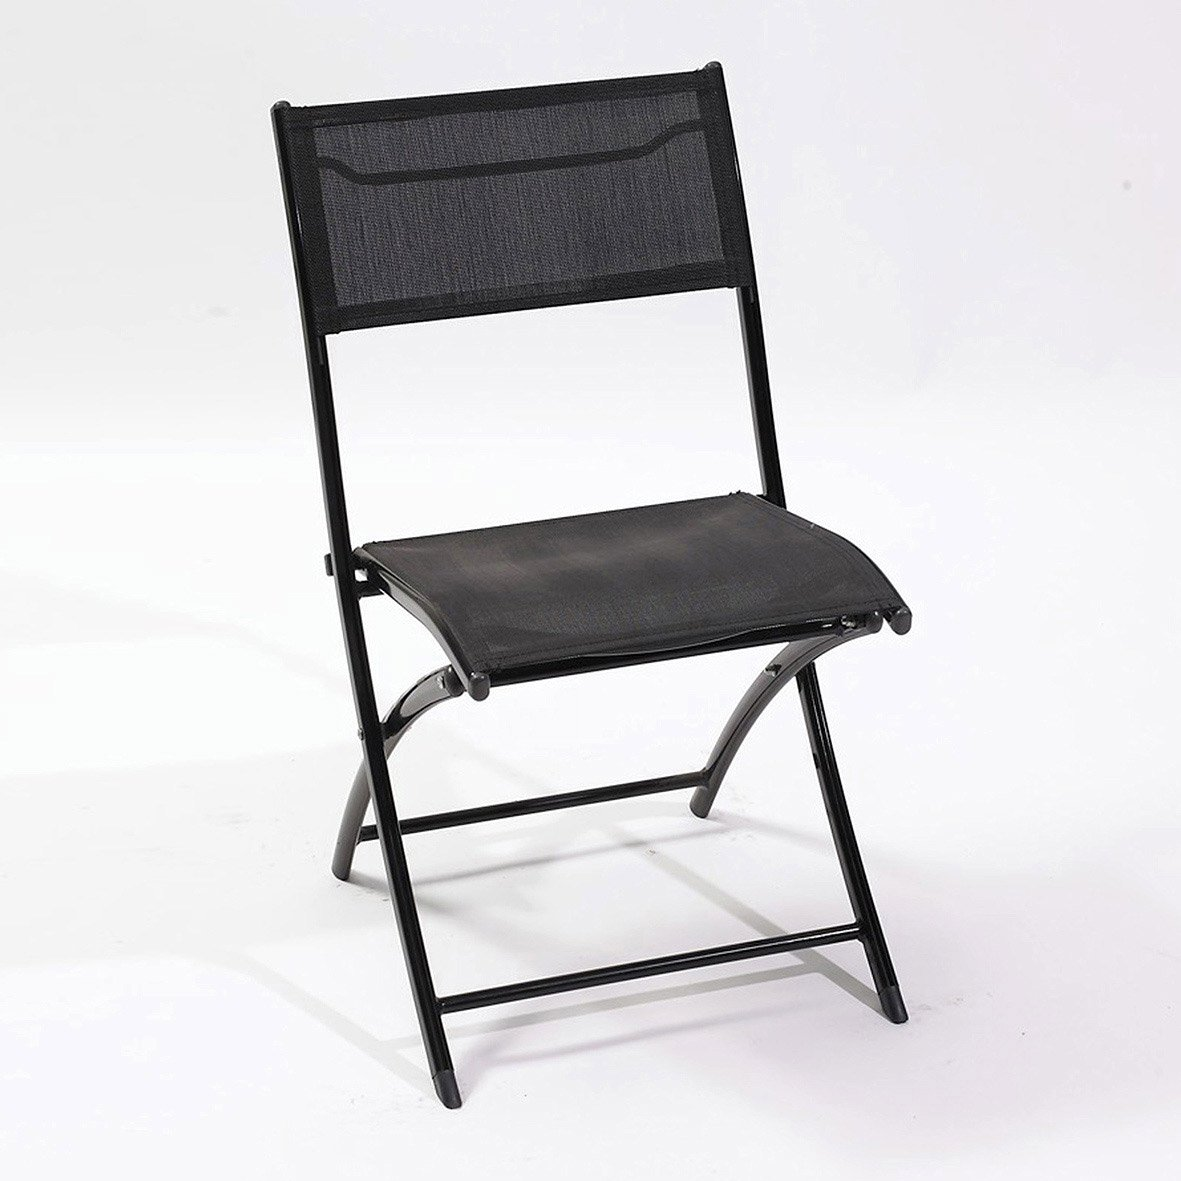 chaise de jardin en aluminium noir leroy merlin. Black Bedroom Furniture Sets. Home Design Ideas